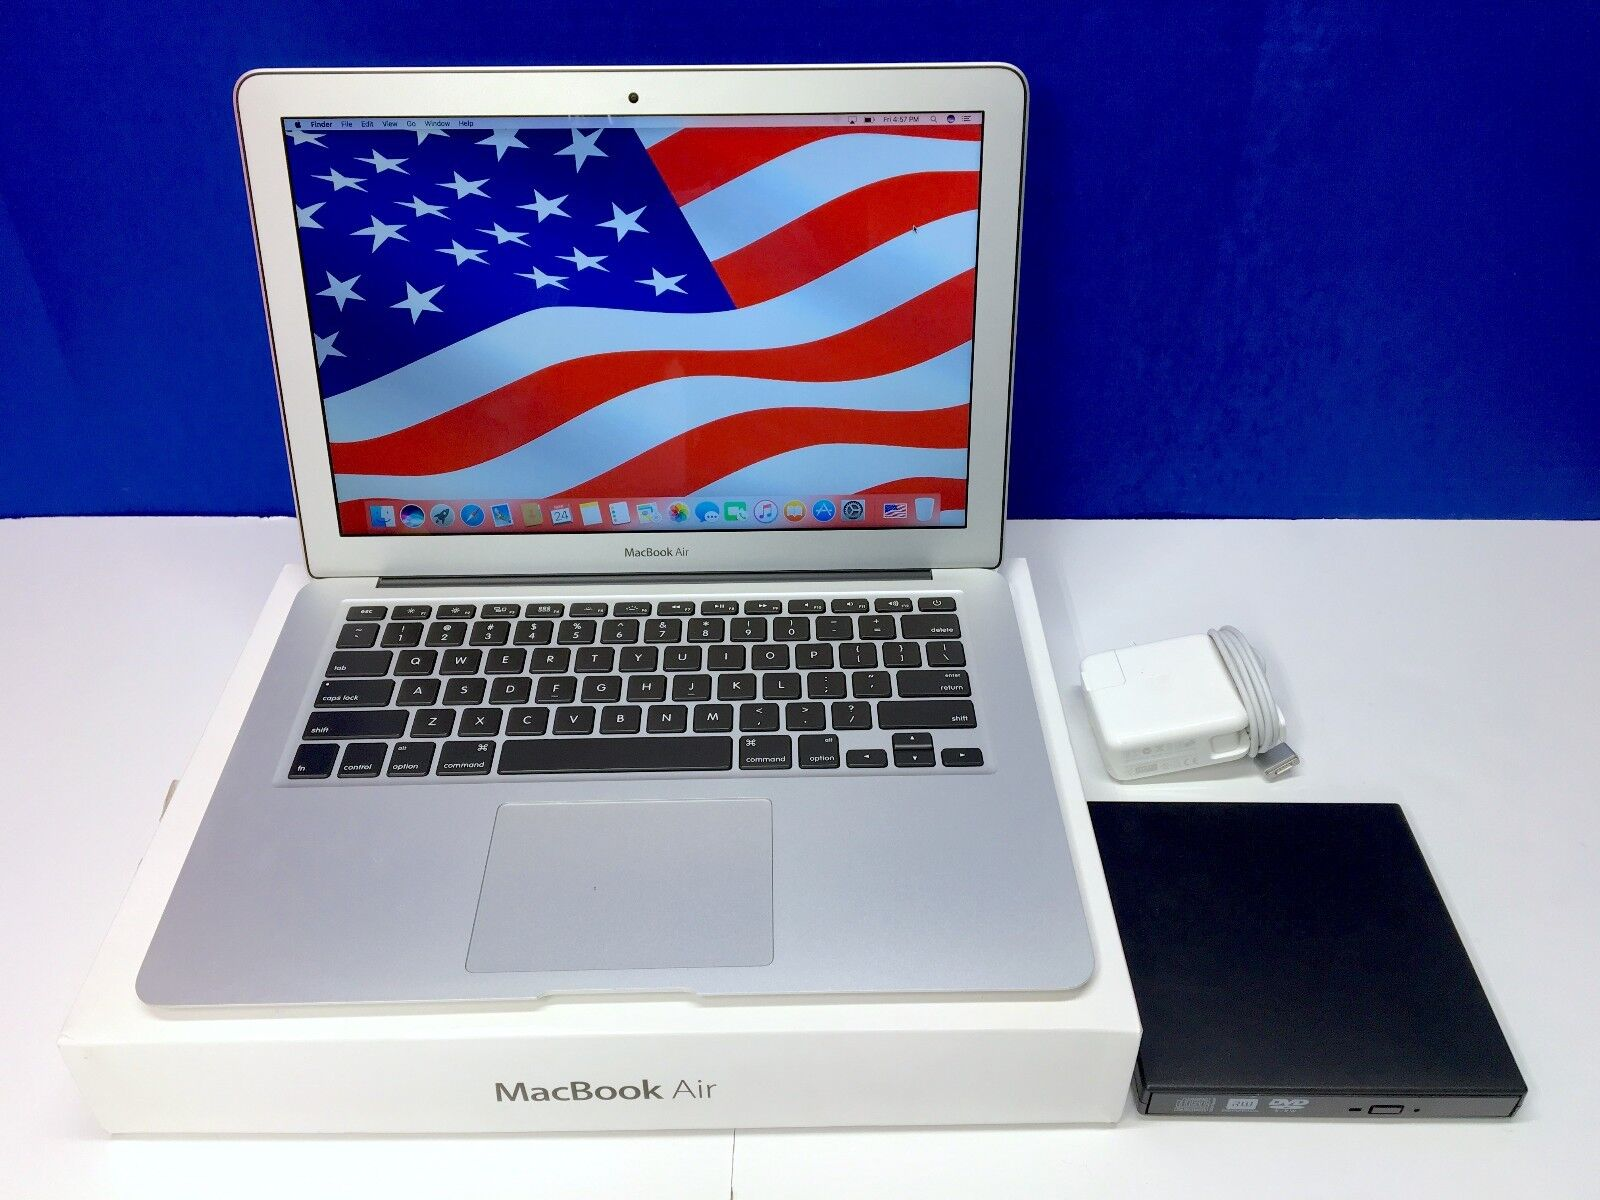 Apple 13in MacBook Air Core i7 OSX-2017 / 256GB+ Storage / 3 Year Warranty